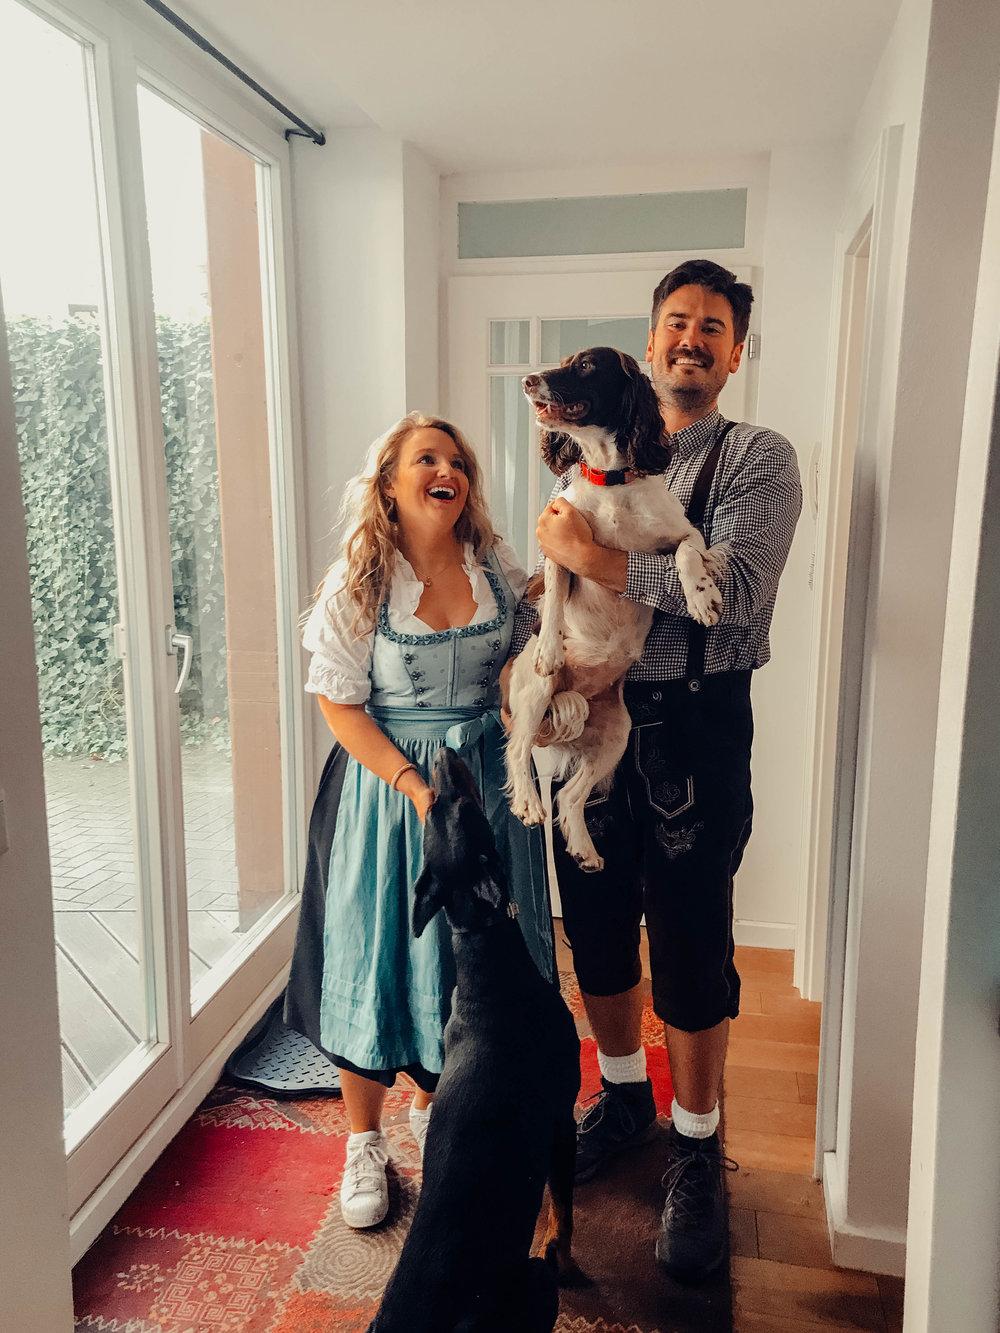 Helene & family preparing for Oktoberfest (HQ: yes, we're fully in puppy love too)